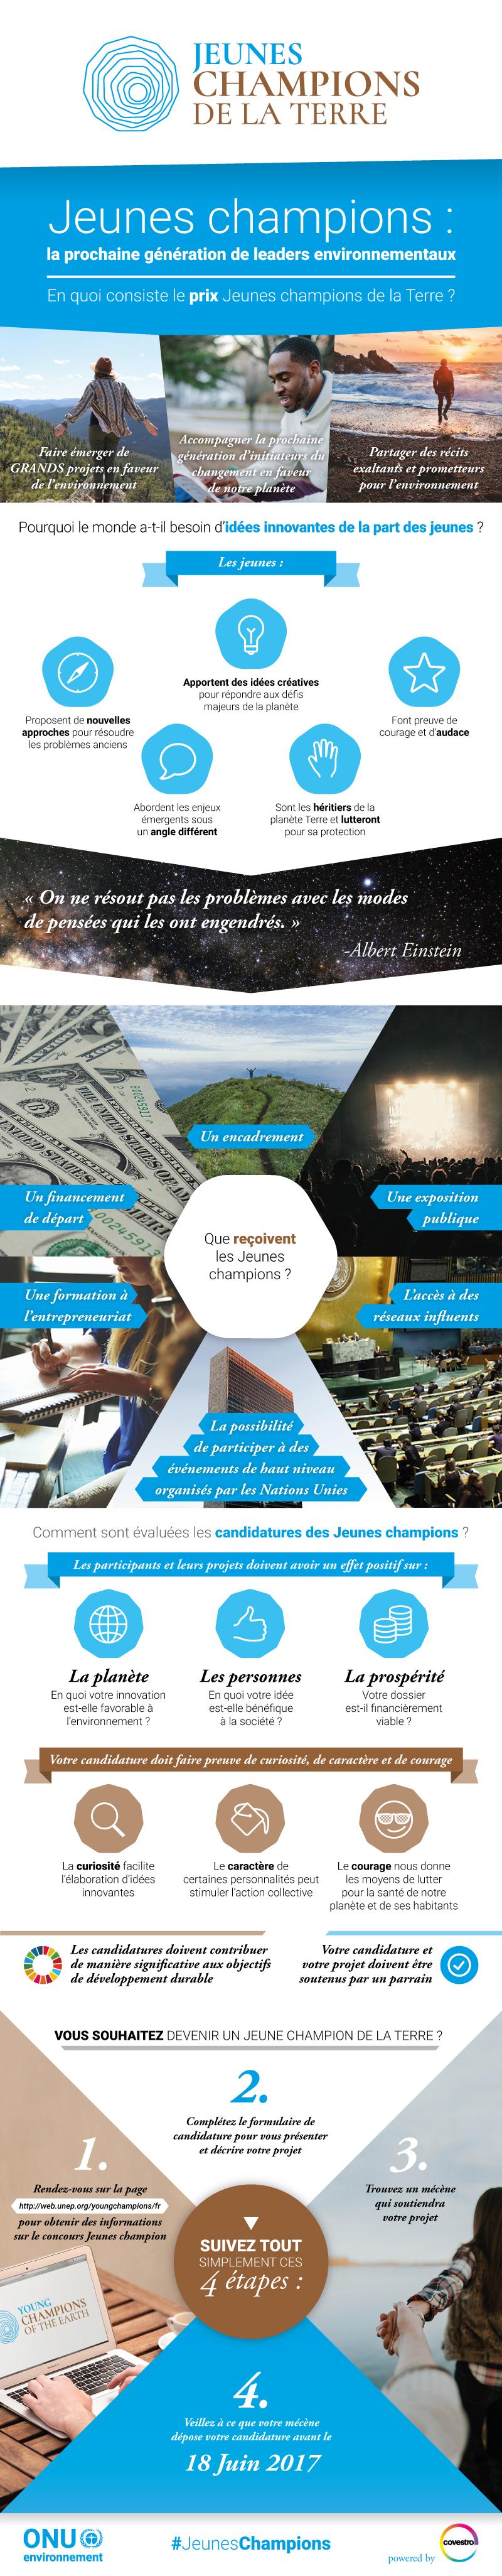 YCotE_Infographic_fr.jpg